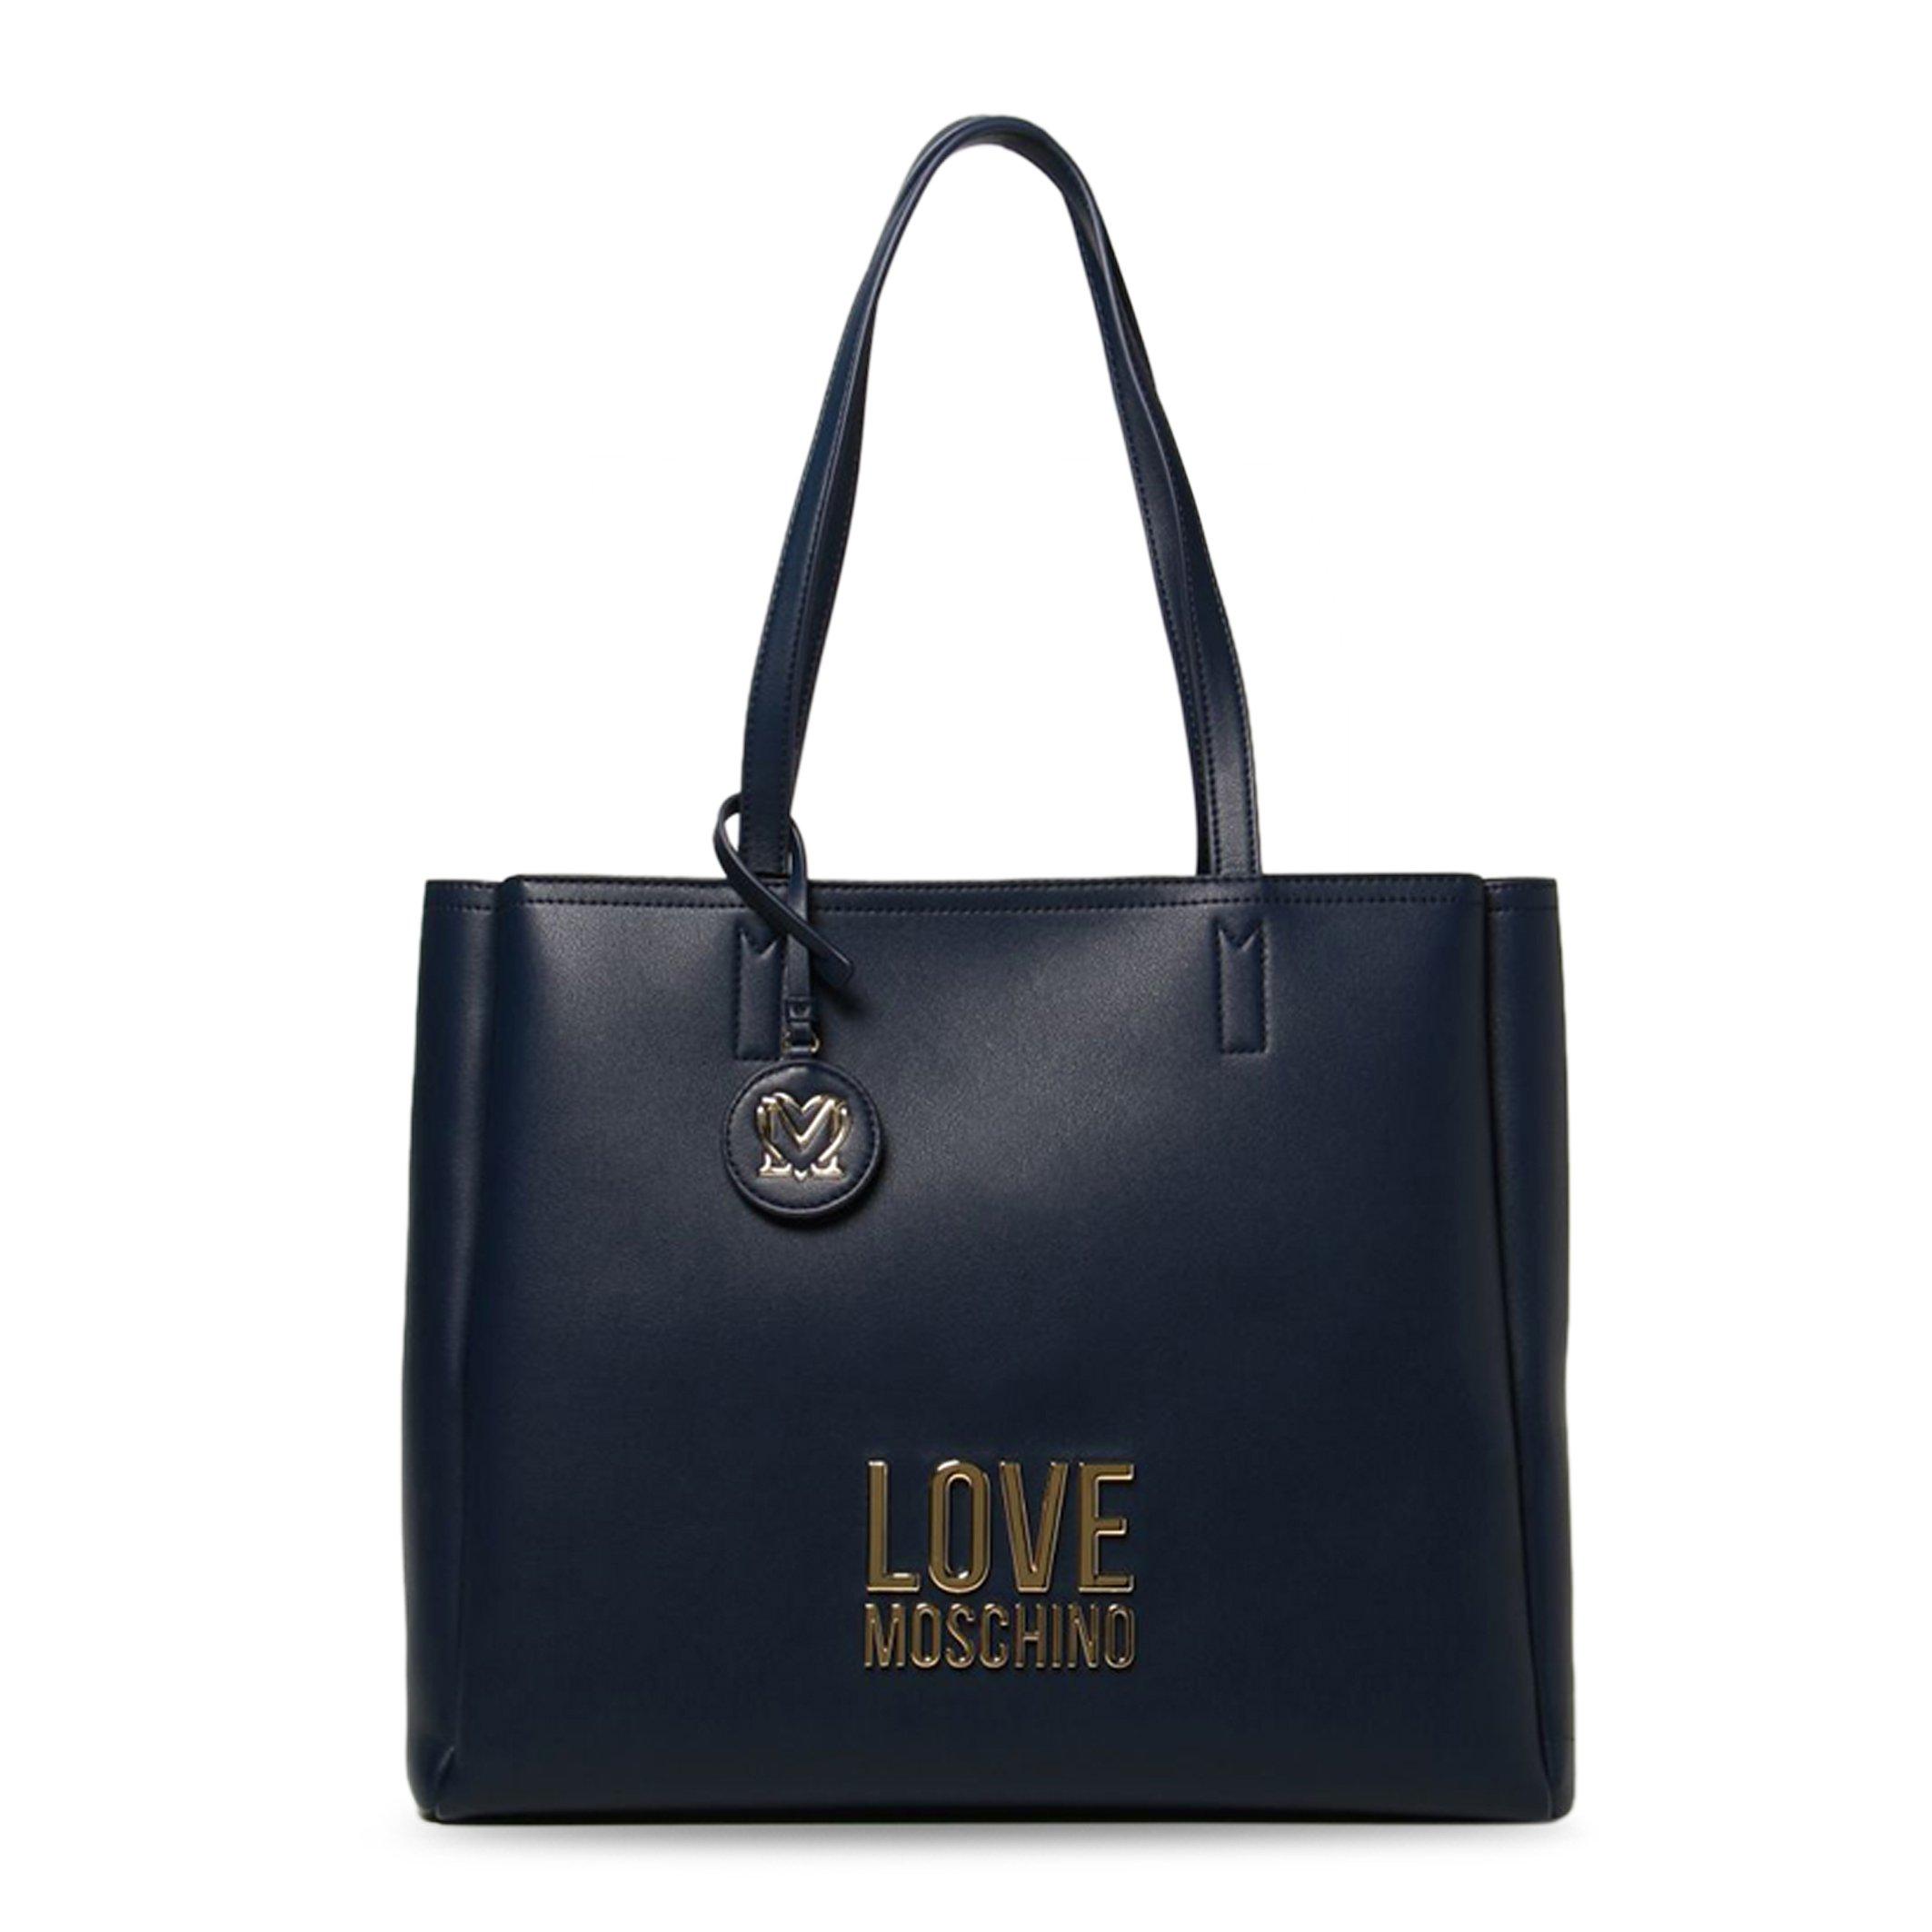 Love Moschino Women's Shopping Bag Various Colours JC4100PP1DLJ0 - blue NOSIZE